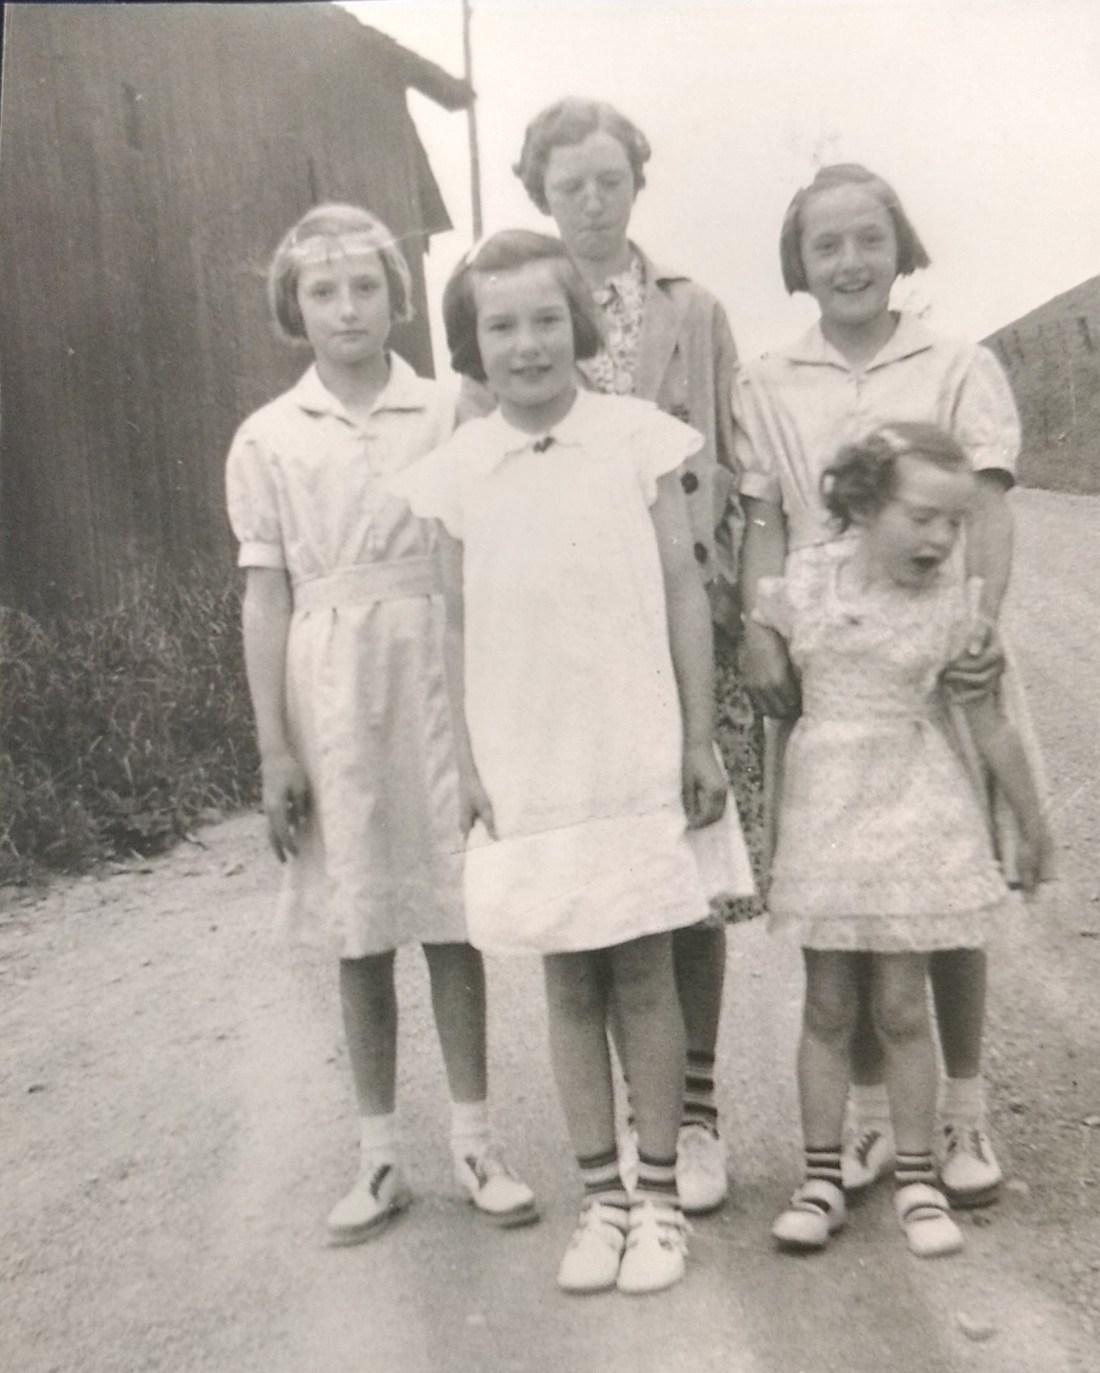 Christine Rachel, Claudien, Betty, Helen on their way to Sunday School